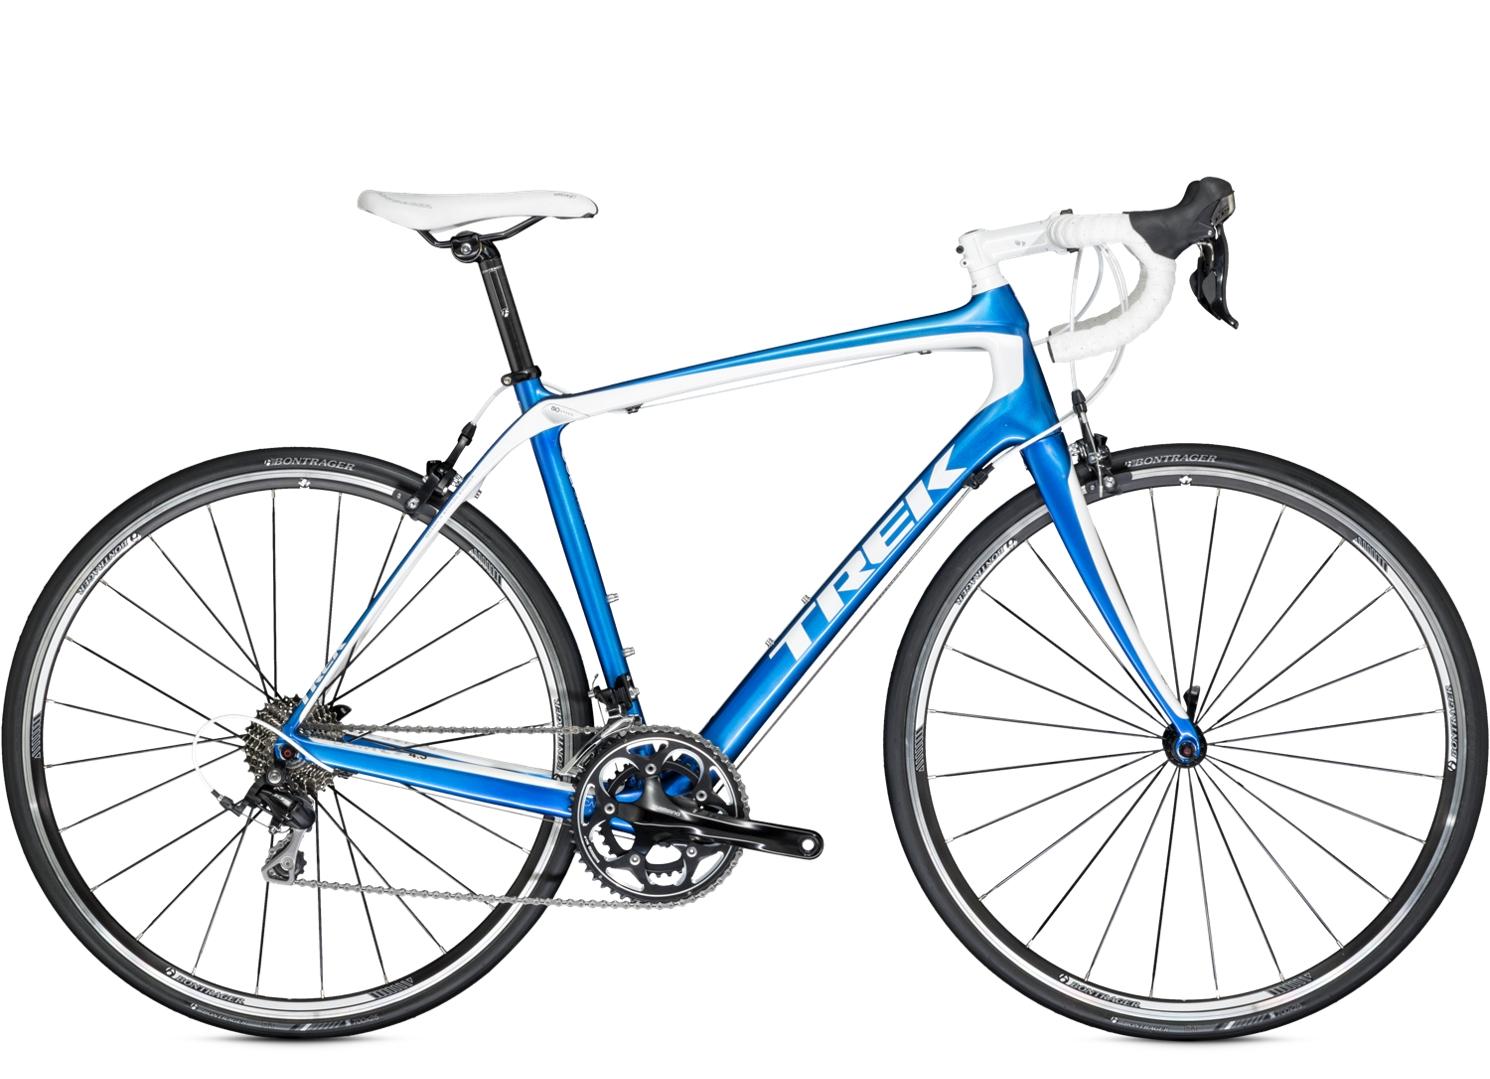 2014 Domane 4.3 Compact - Bike Archive - Trek Bicycle